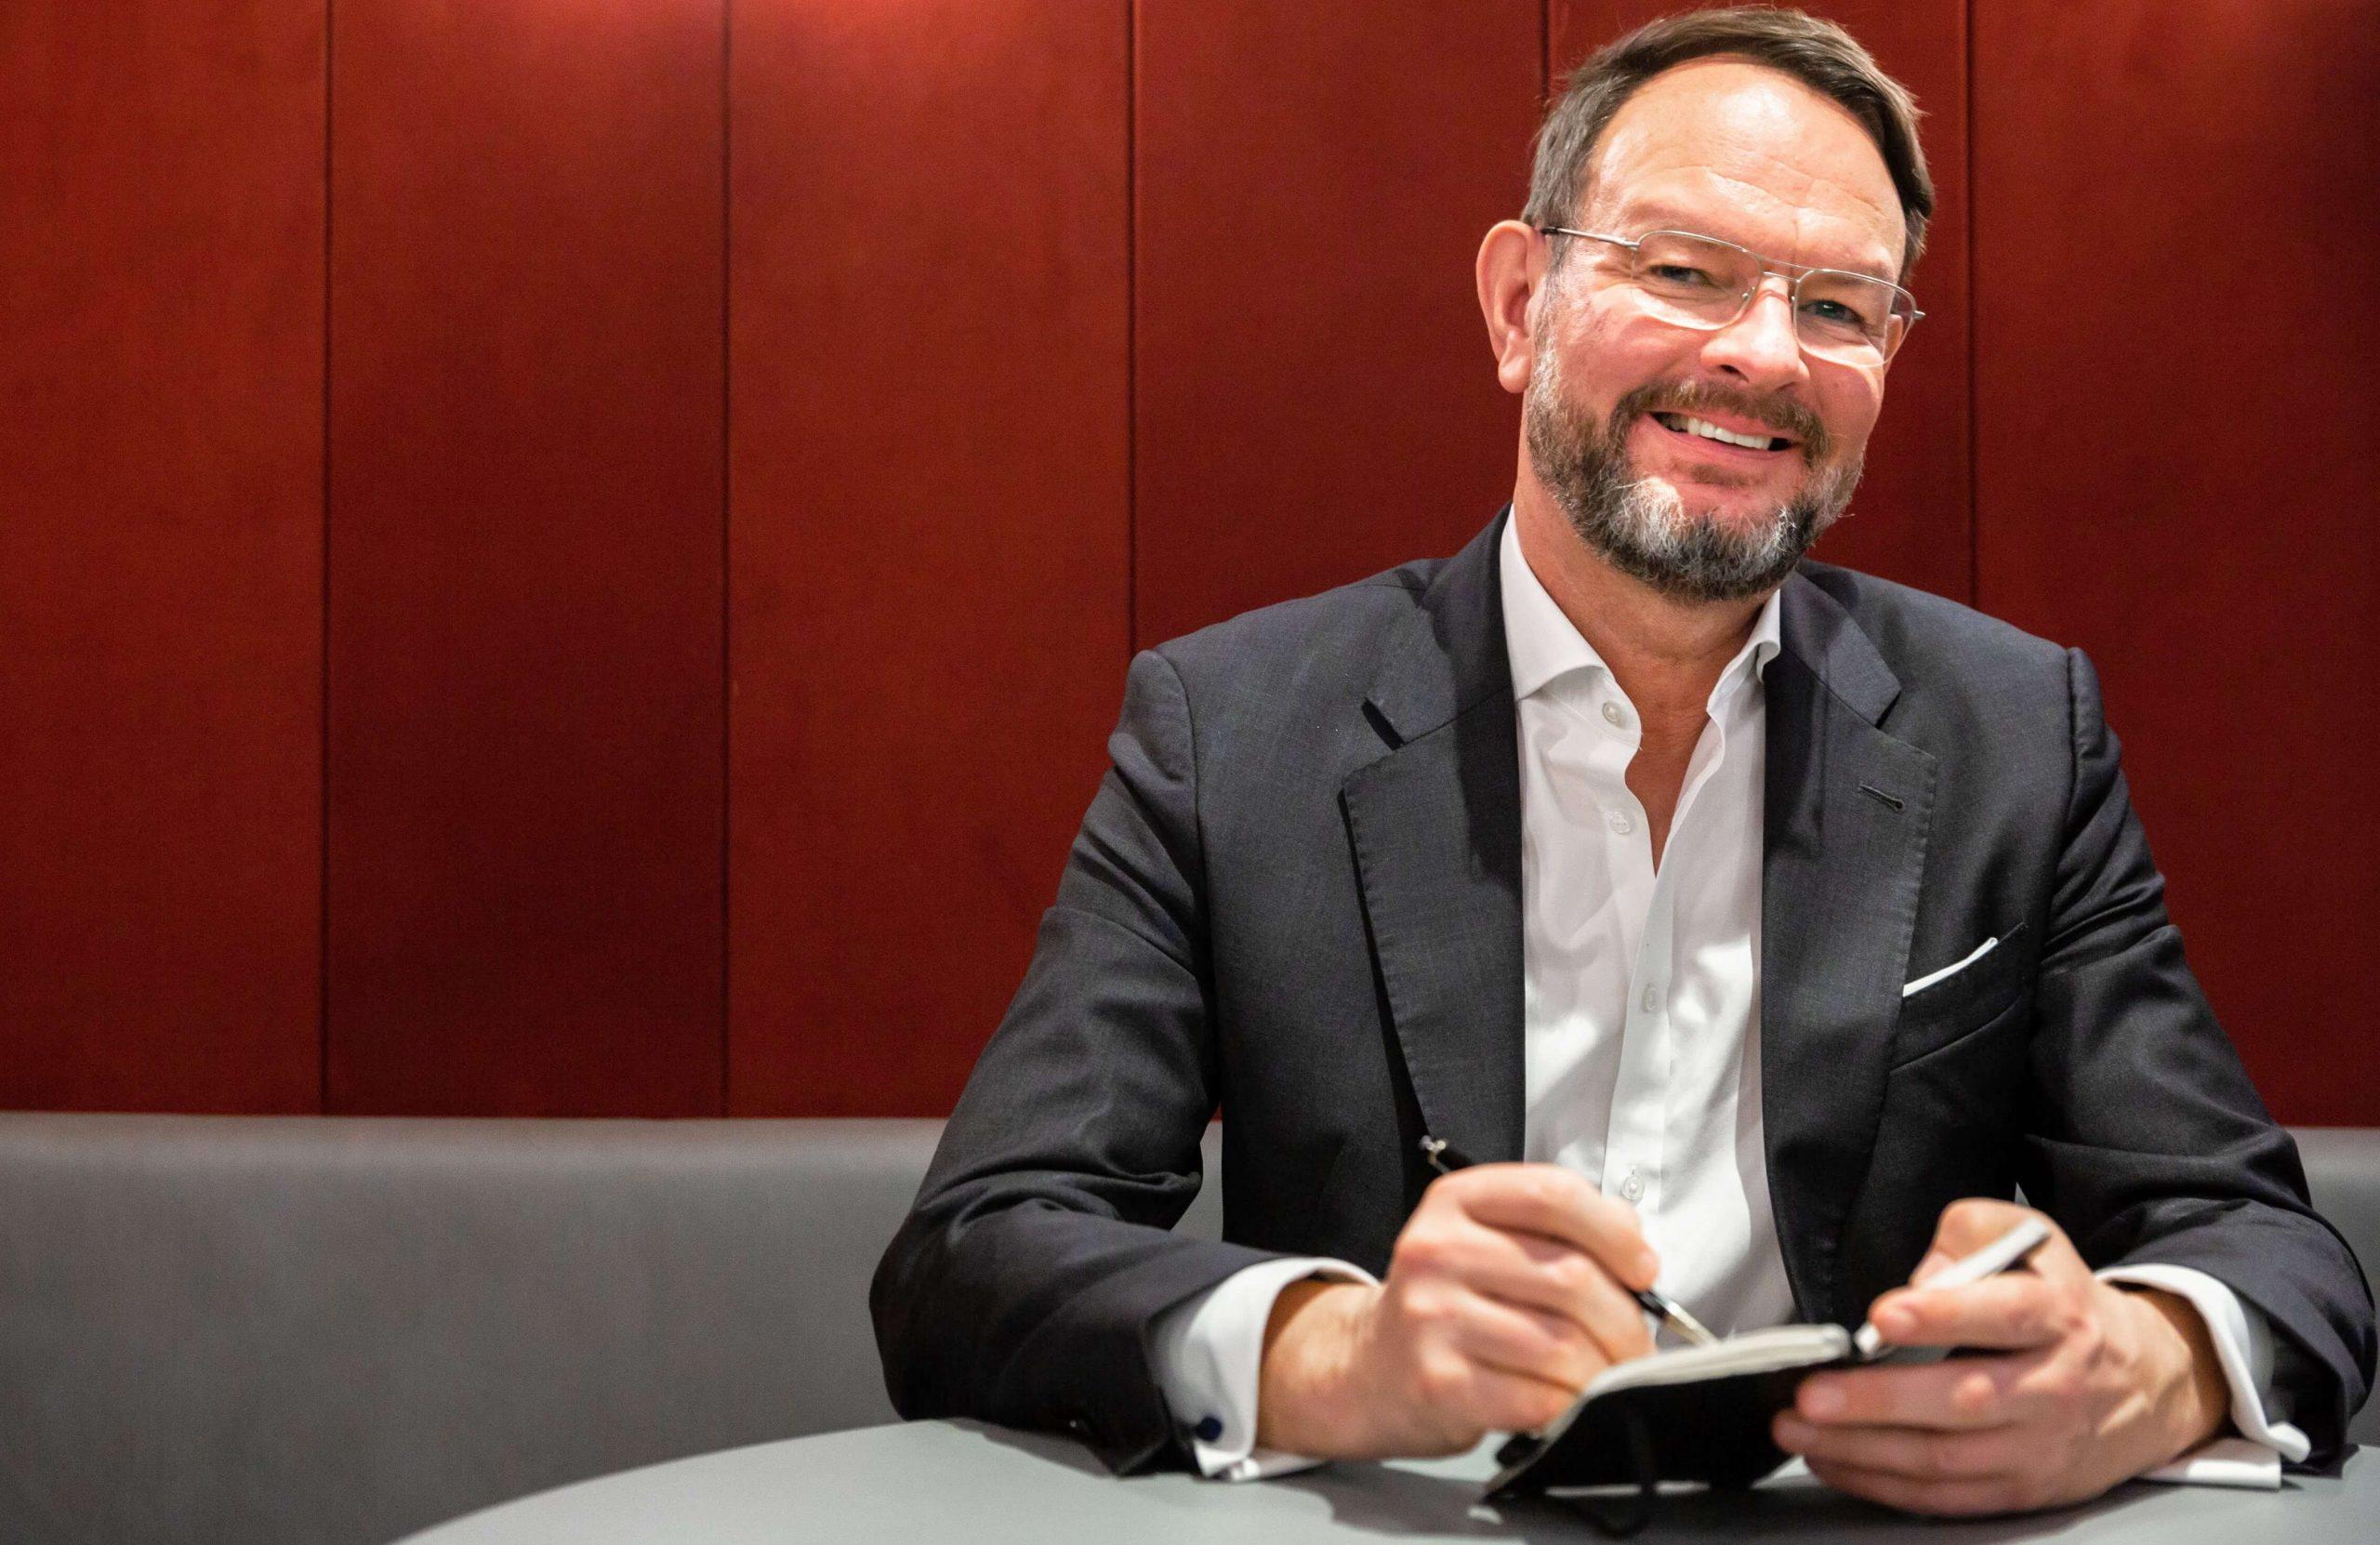 Rolf Kassel - Innovationsmanager werden gebraucht